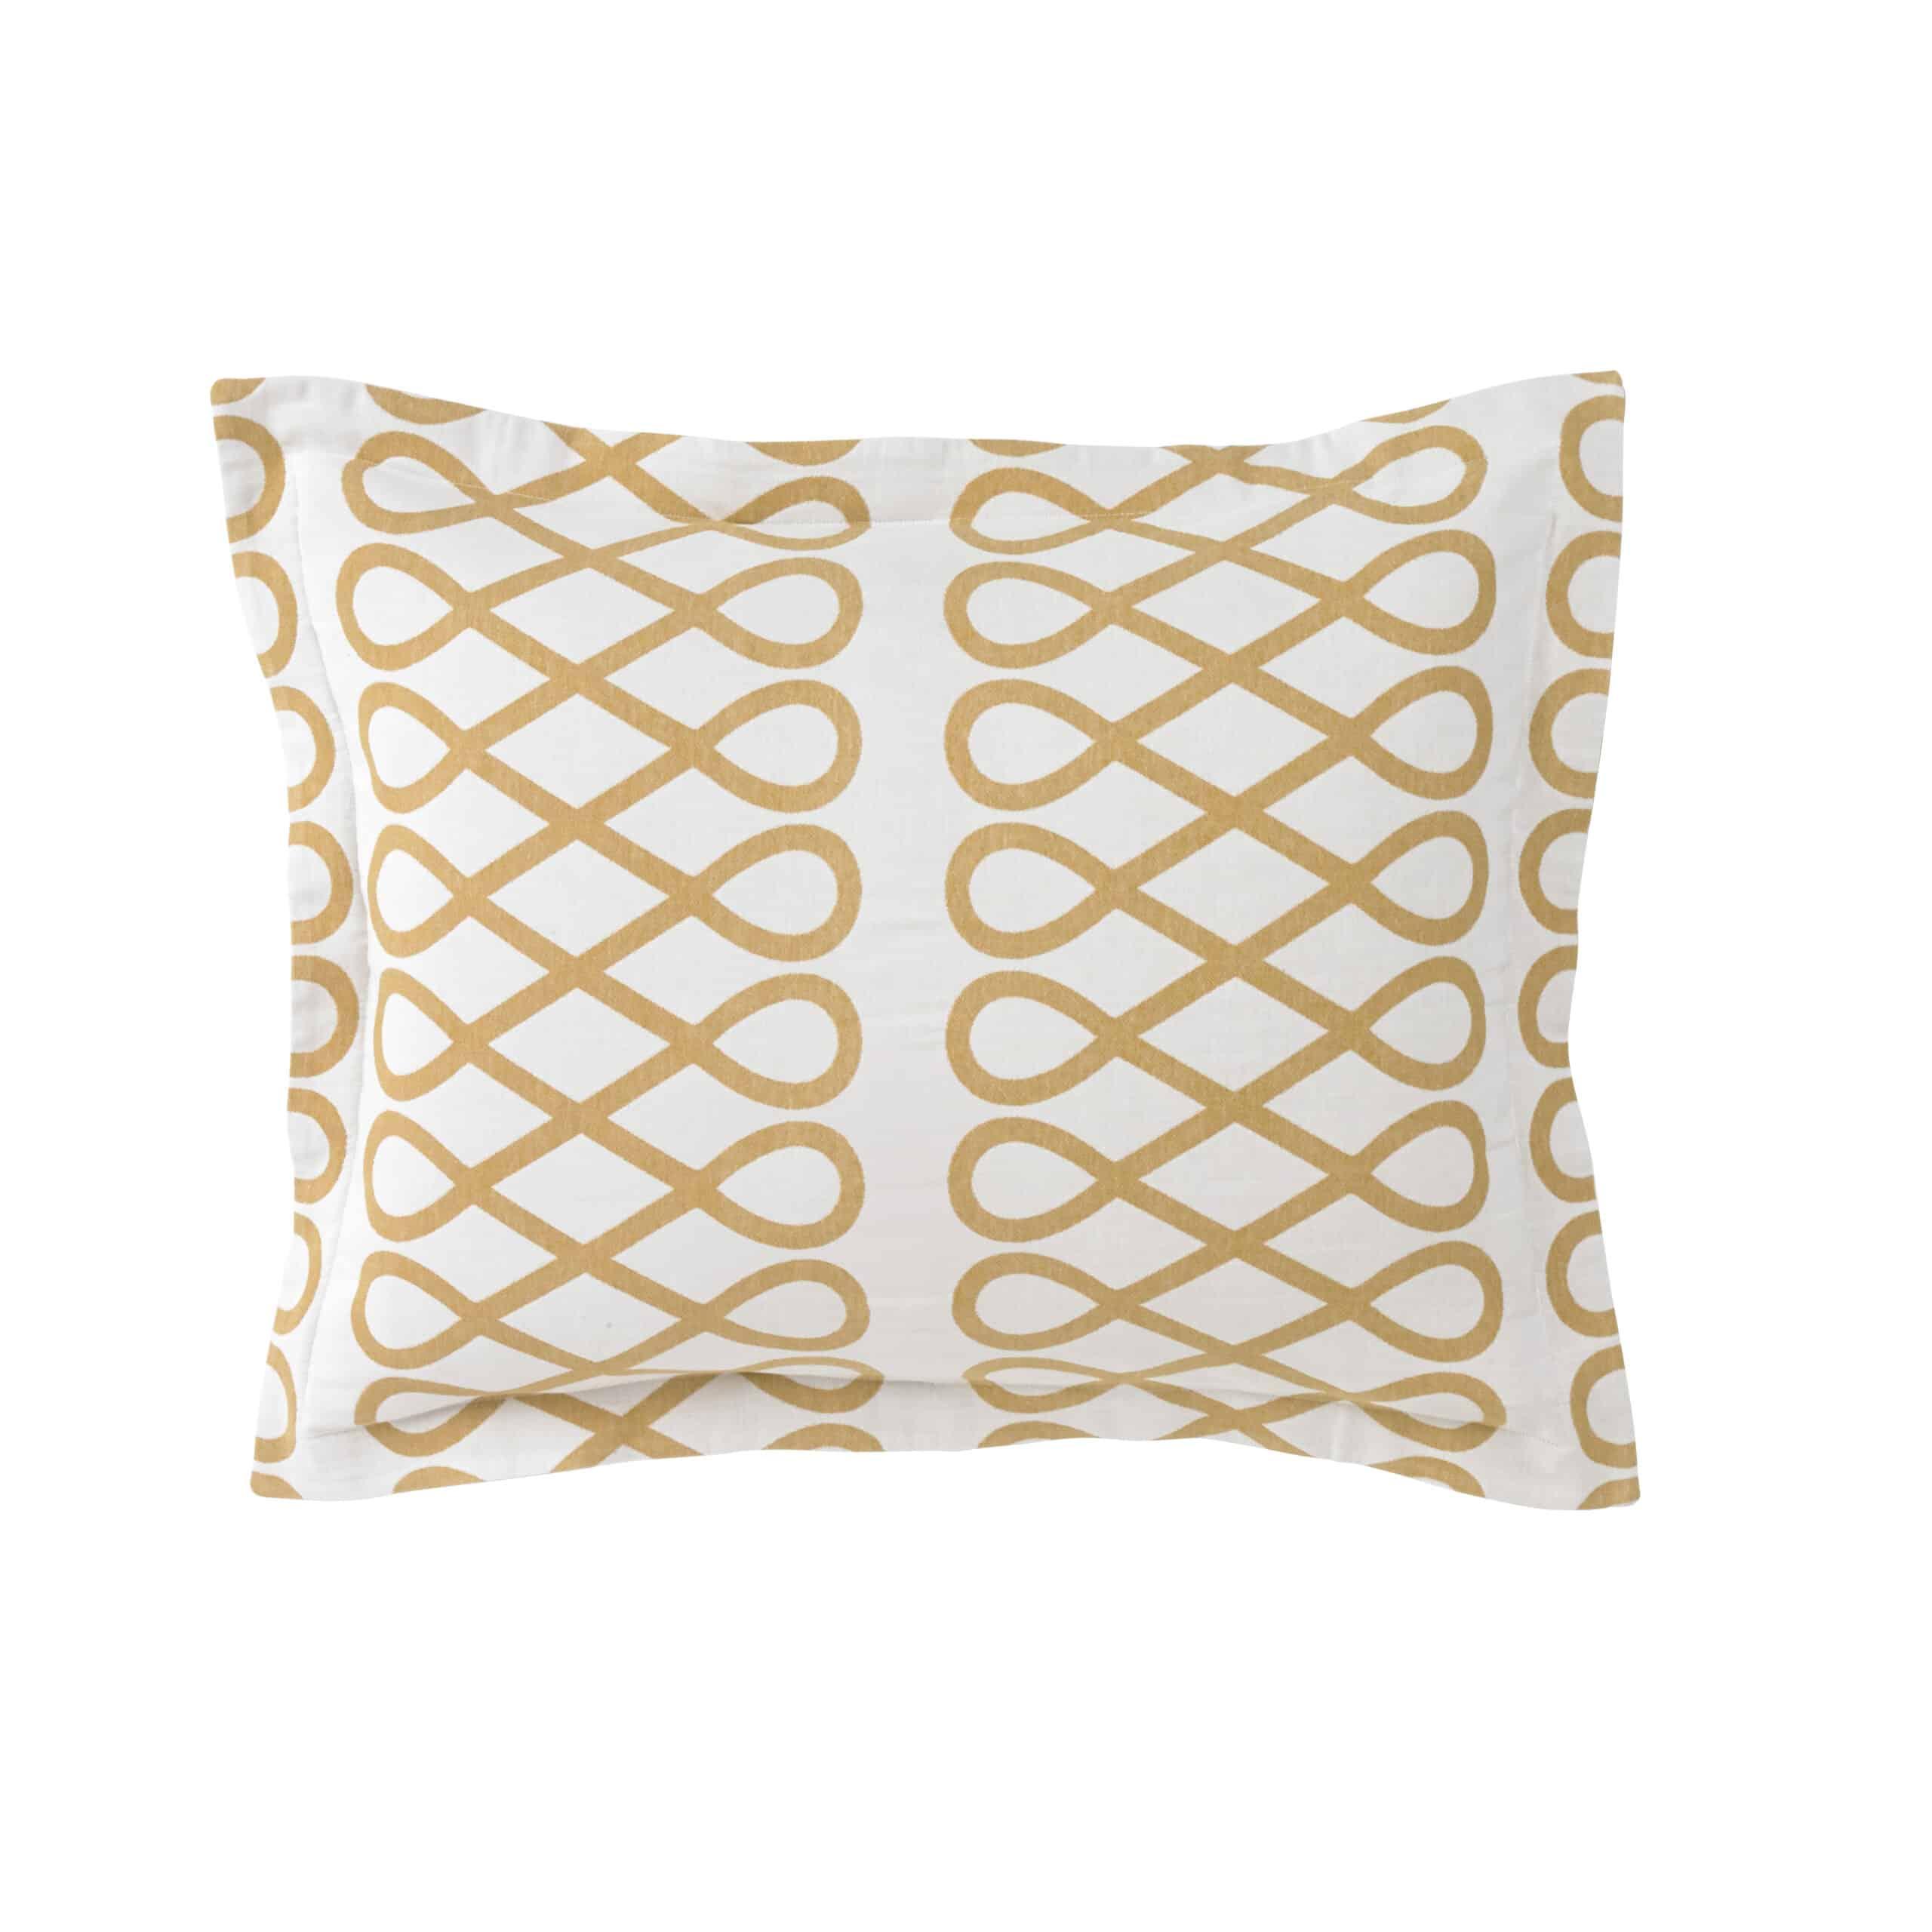 Loop Ochre Sham Pair_Standard All Modern Bedding Cococozy